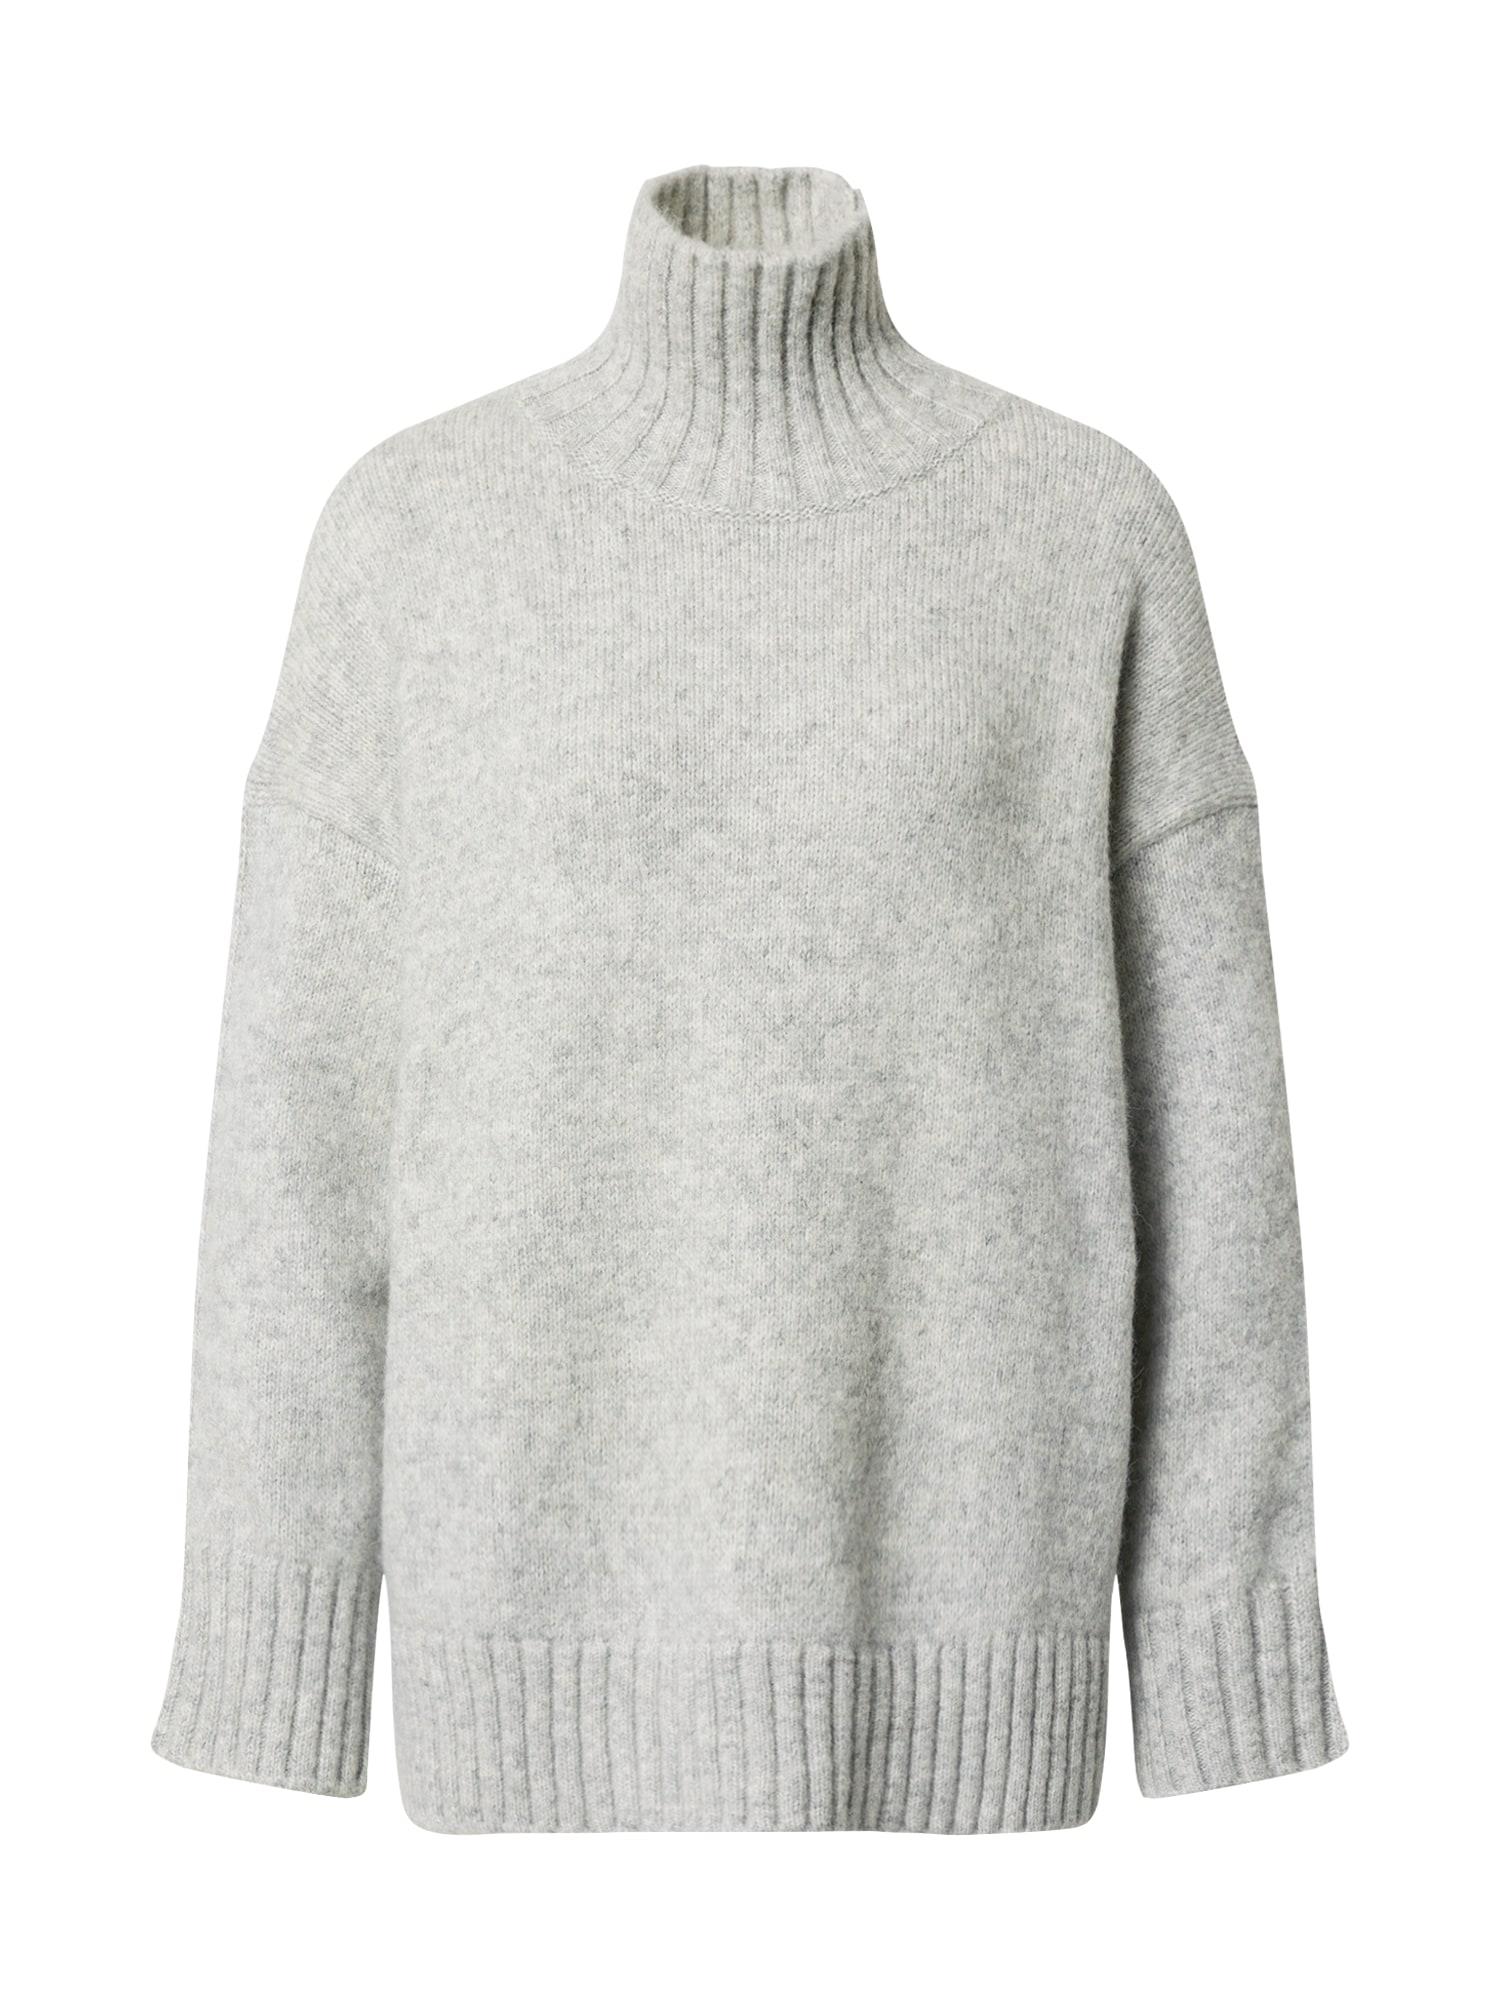 AG Jeans Megztinis 'Boxy' šviesiai pilka